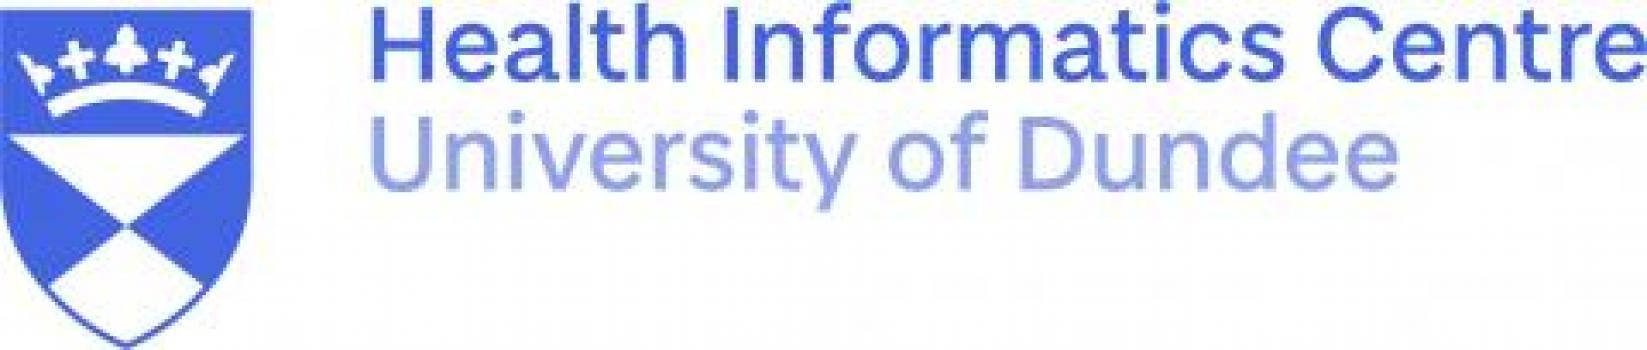 Health informatics Centre